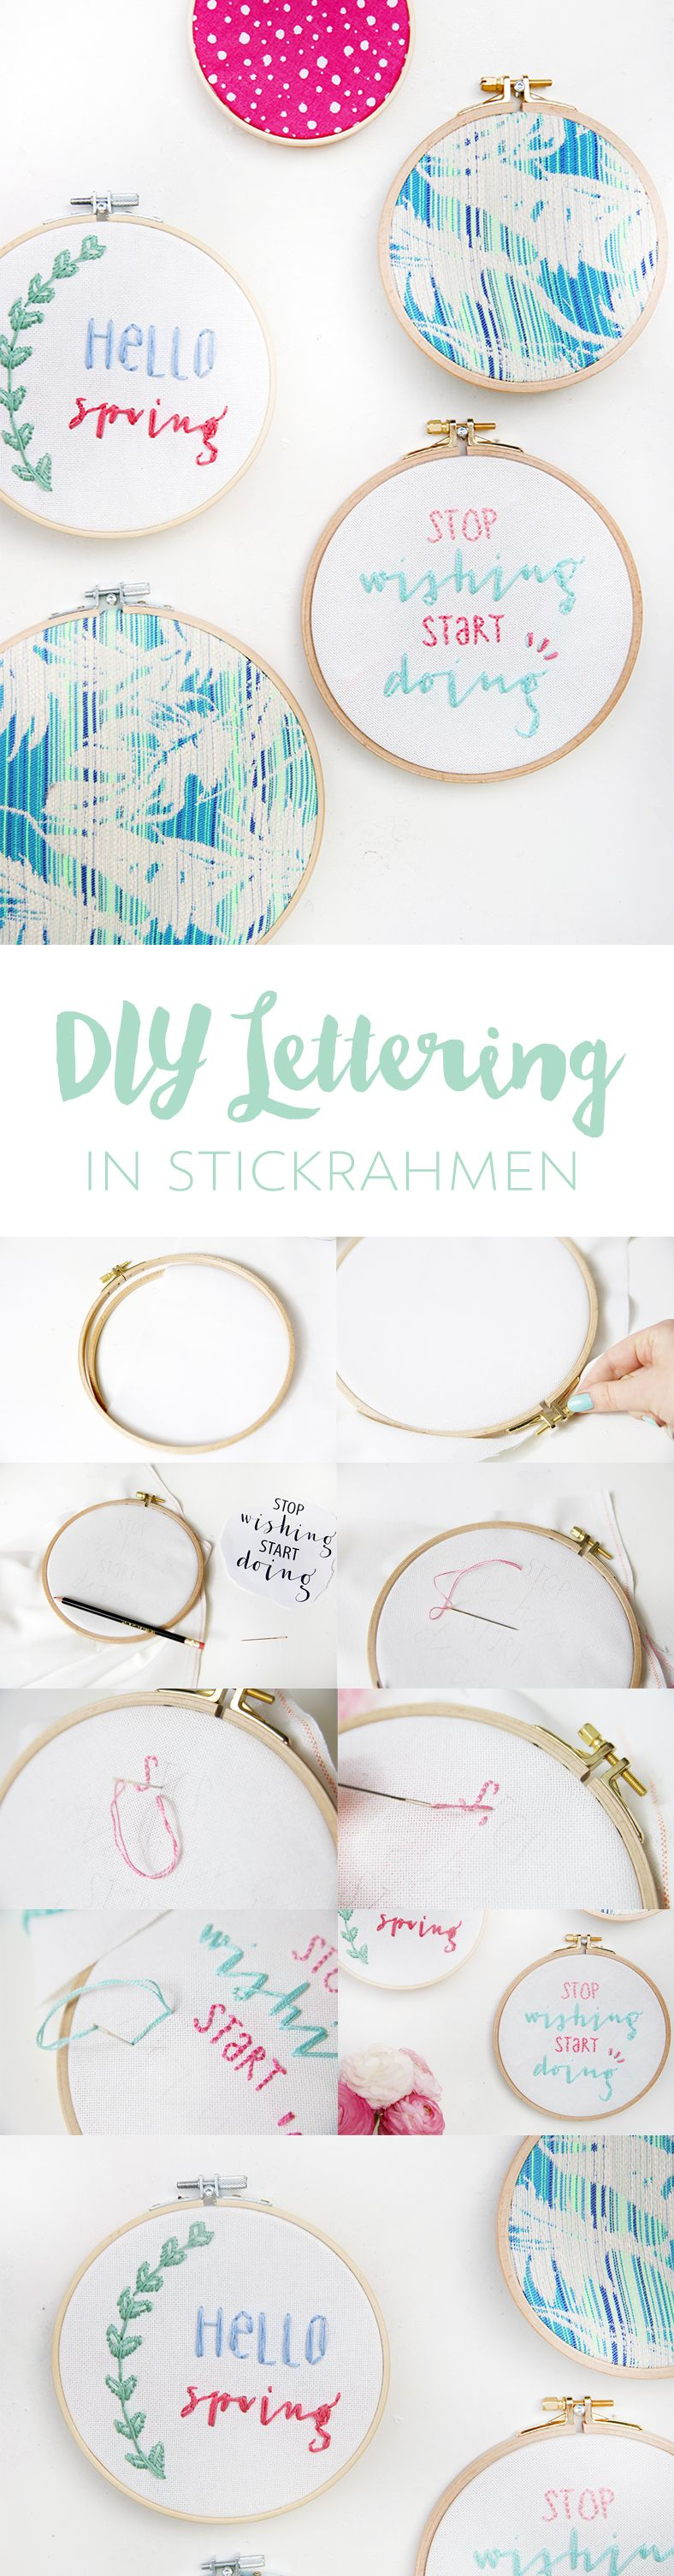 diy lettering stickrahmen im ard buffet get crafty pinterest. Black Bedroom Furniture Sets. Home Design Ideas